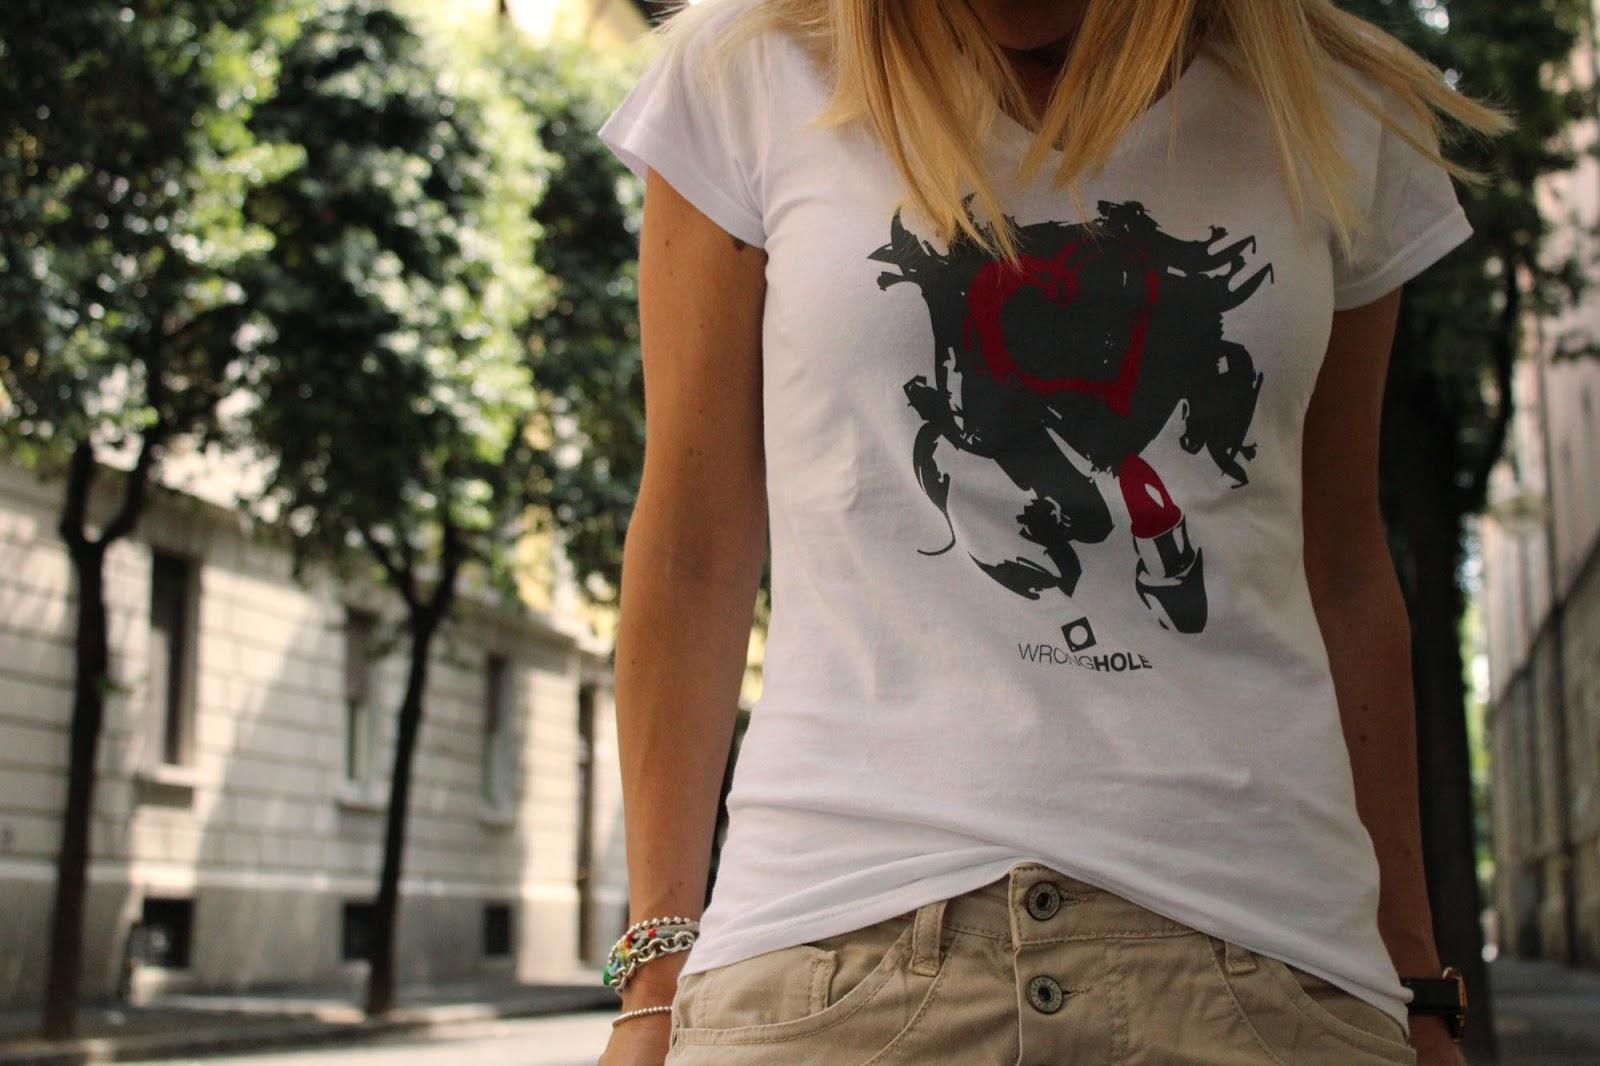 Eniwhere Fashion - Tshirt Wronghole and LuxBag